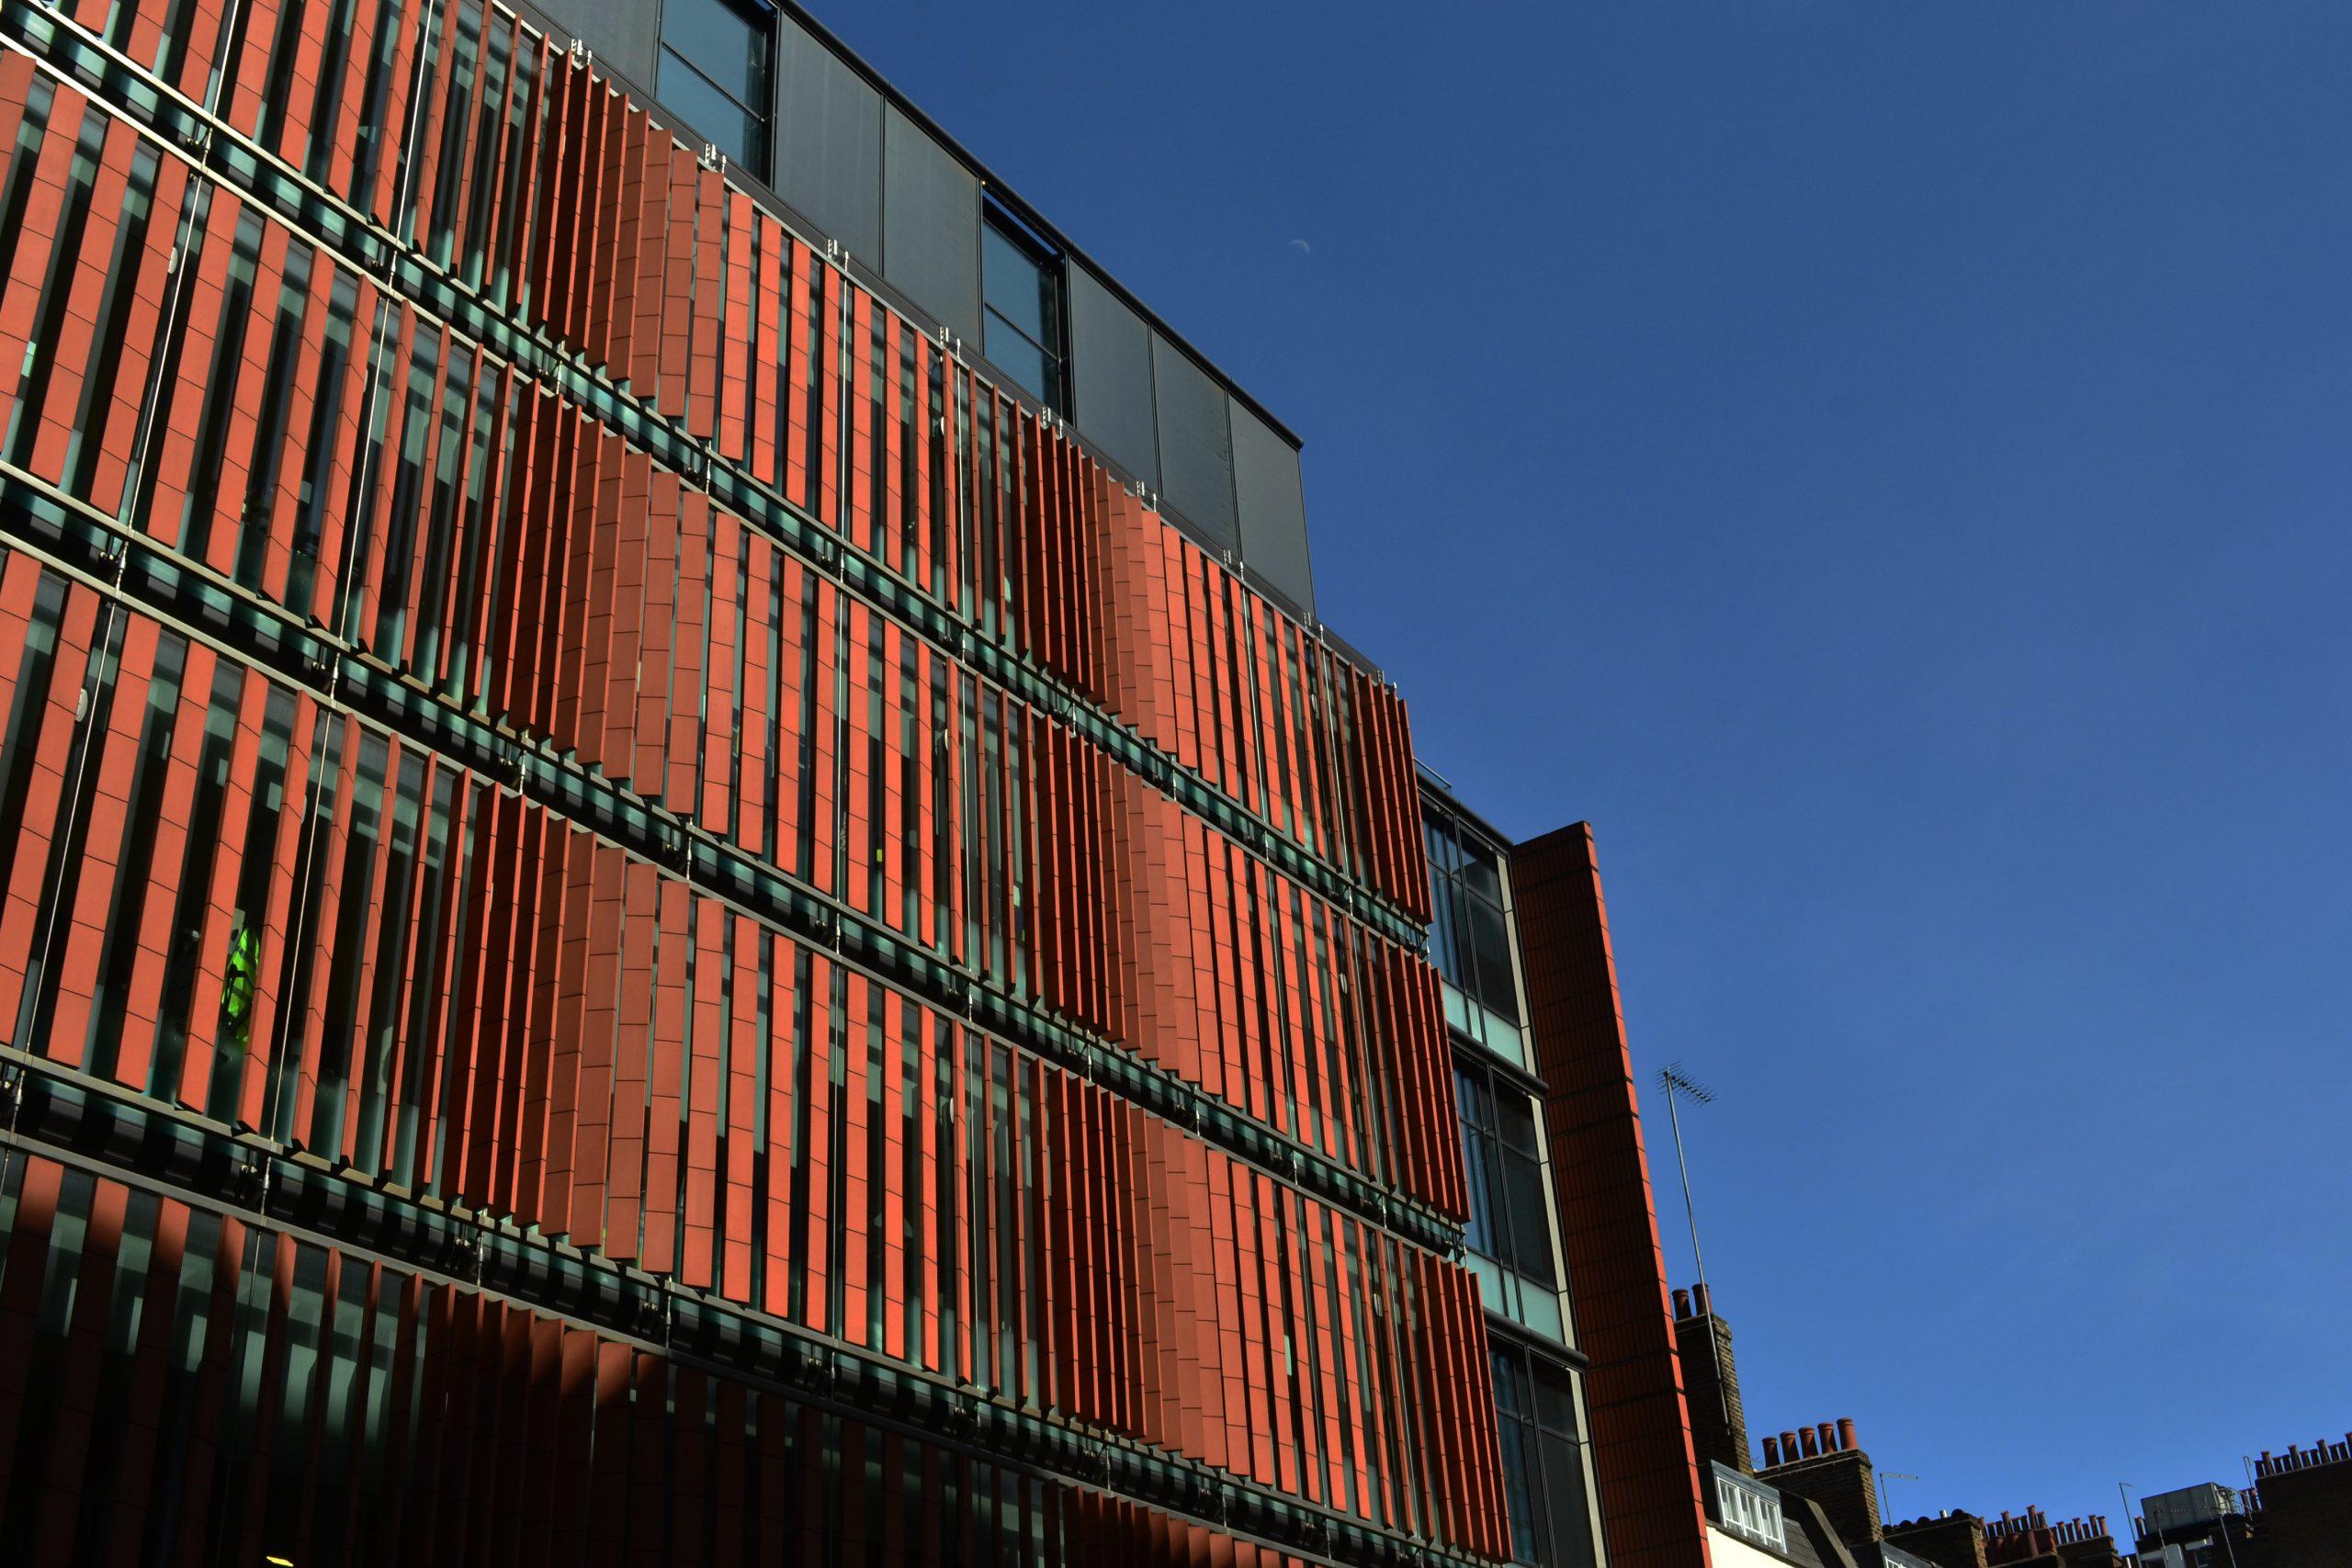 Paul O'Gorman Building, Huntley Street, Bloomsbury Conservation Area